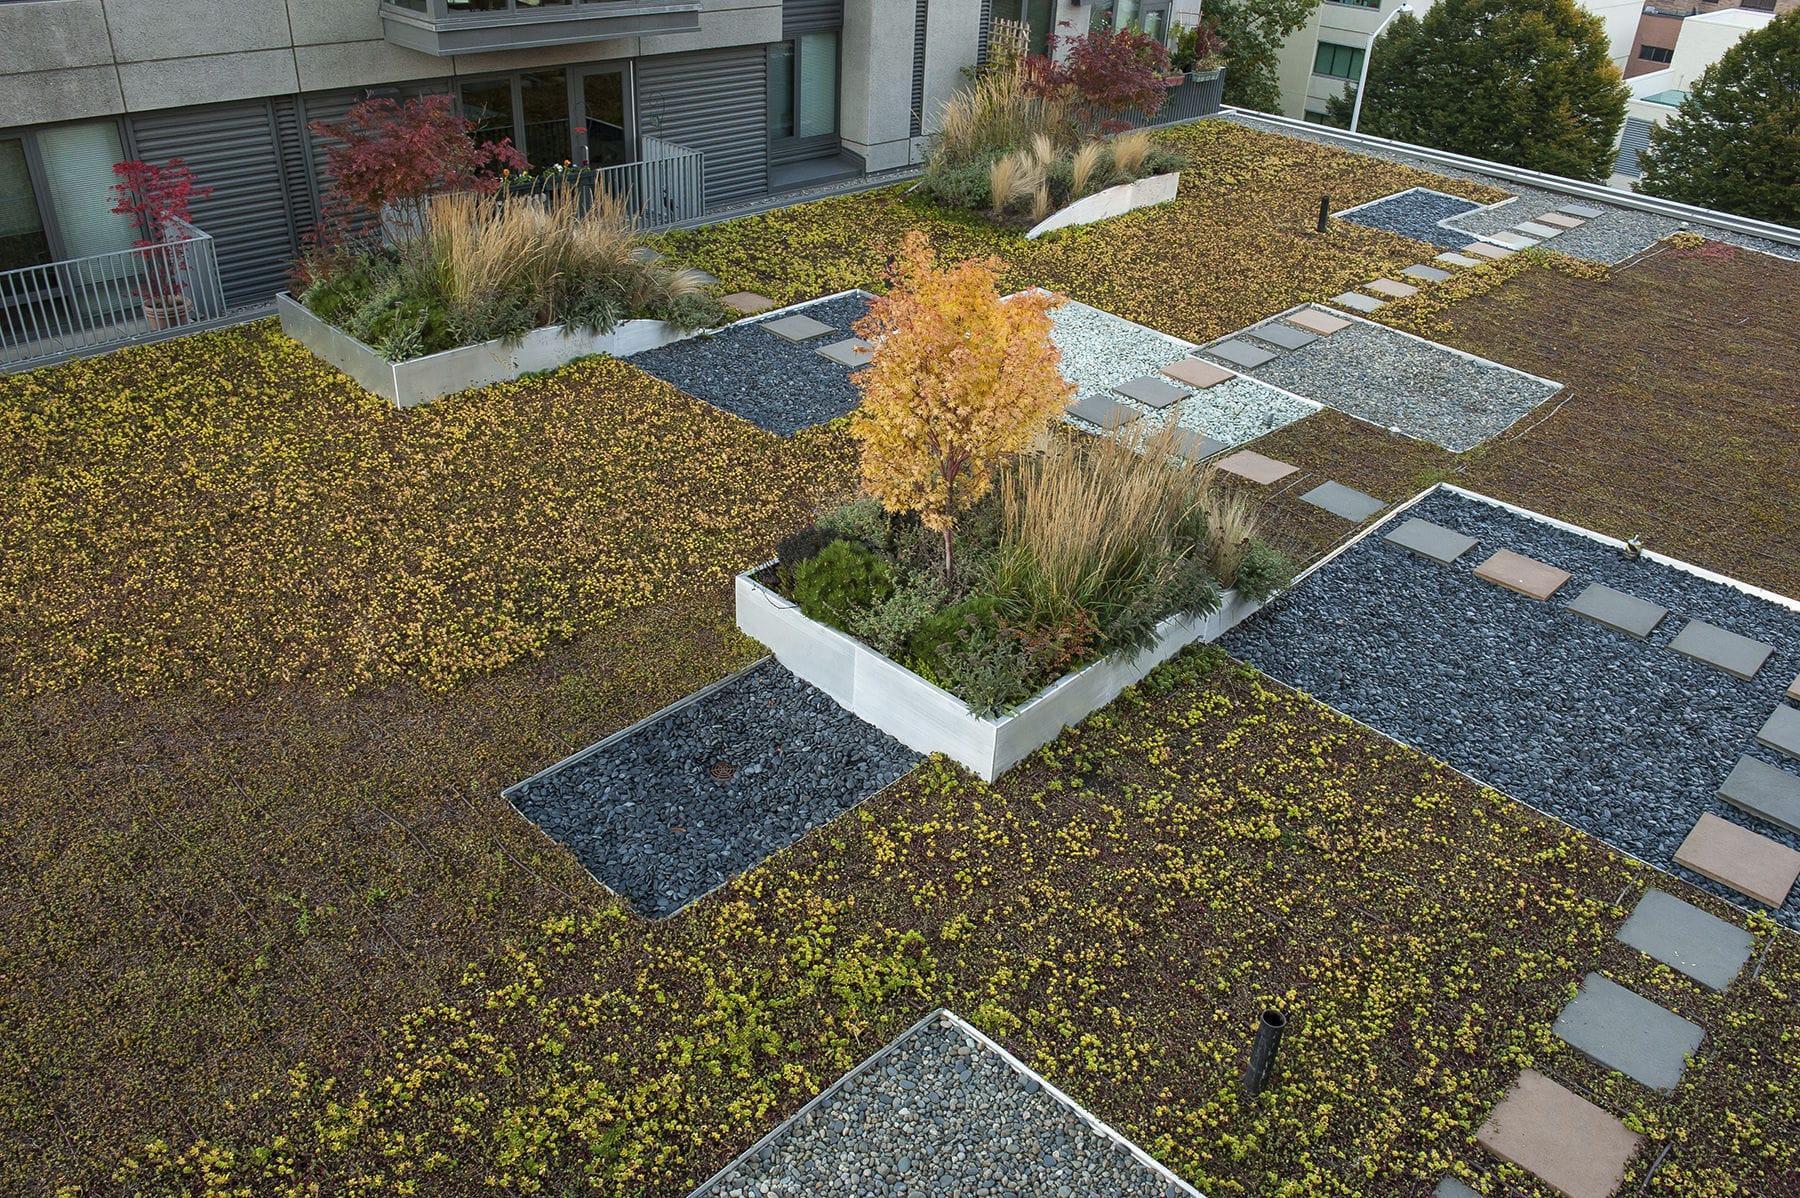 Bordure De Jardin En Aluminium En Forme De L Geoedge